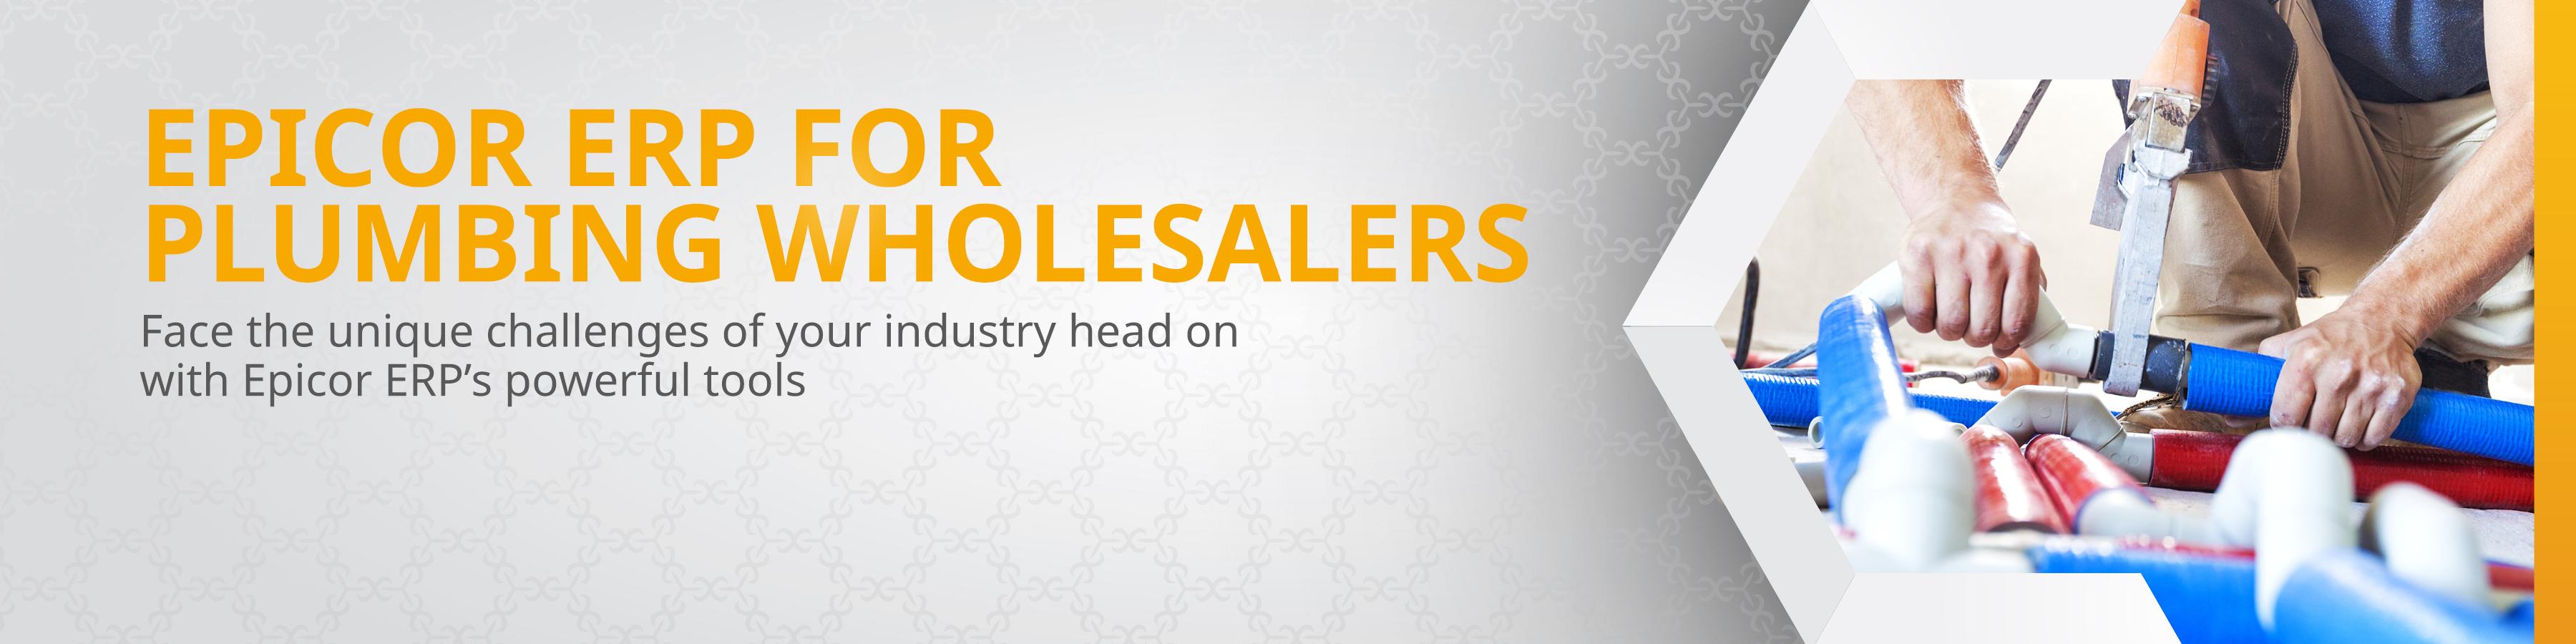 Epicor ERP for Plumbing Wholesalers